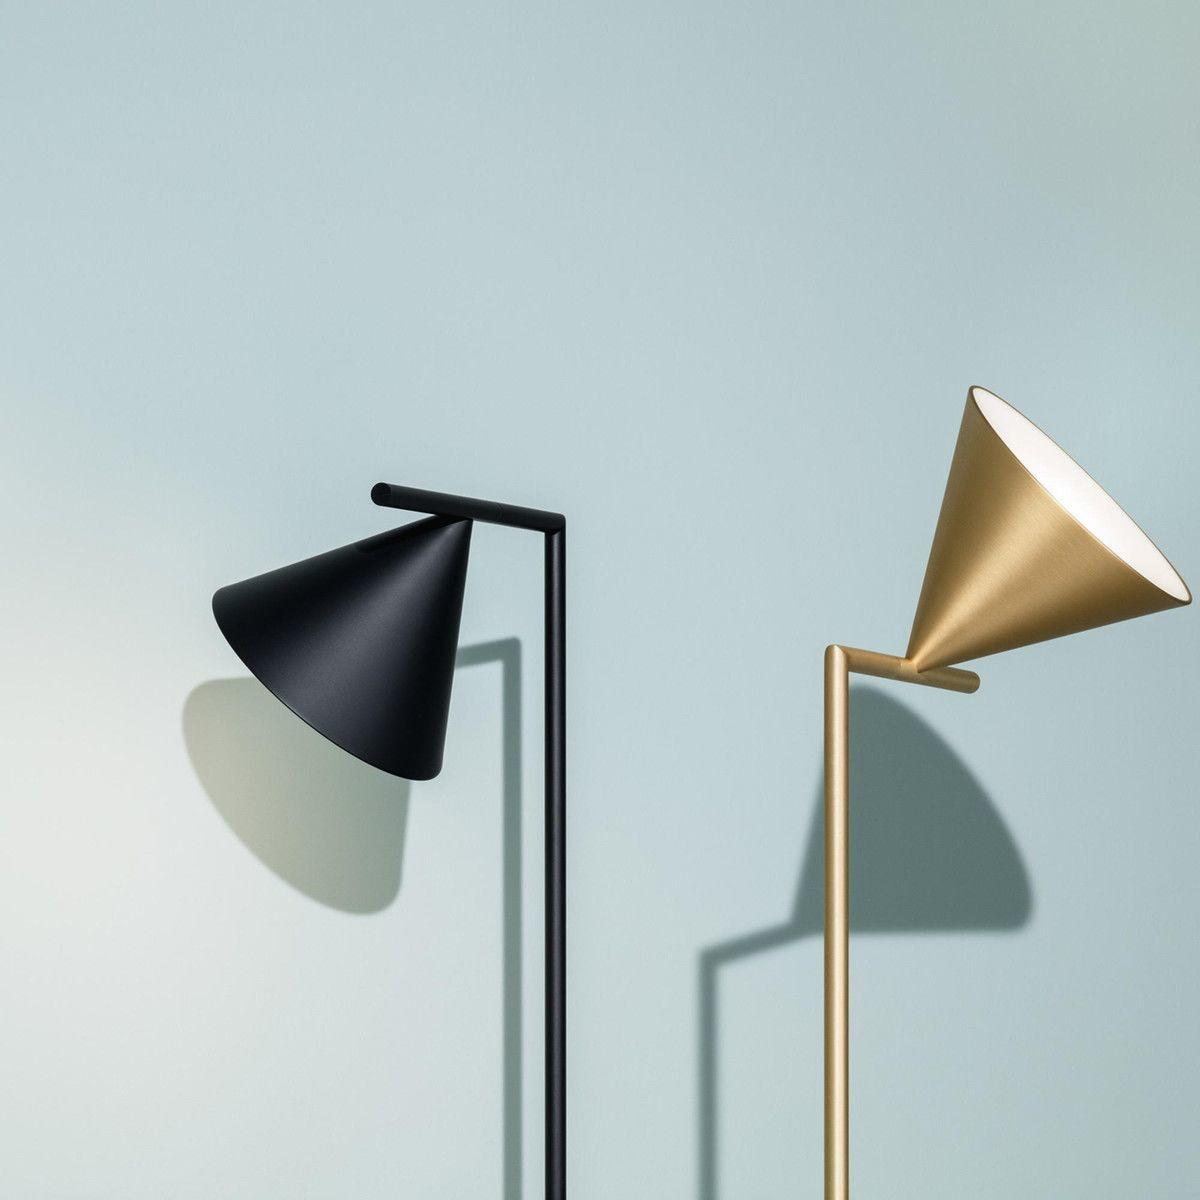 captain flint led stehleuchte flos leuchtmittel leuchten. Black Bedroom Furniture Sets. Home Design Ideas